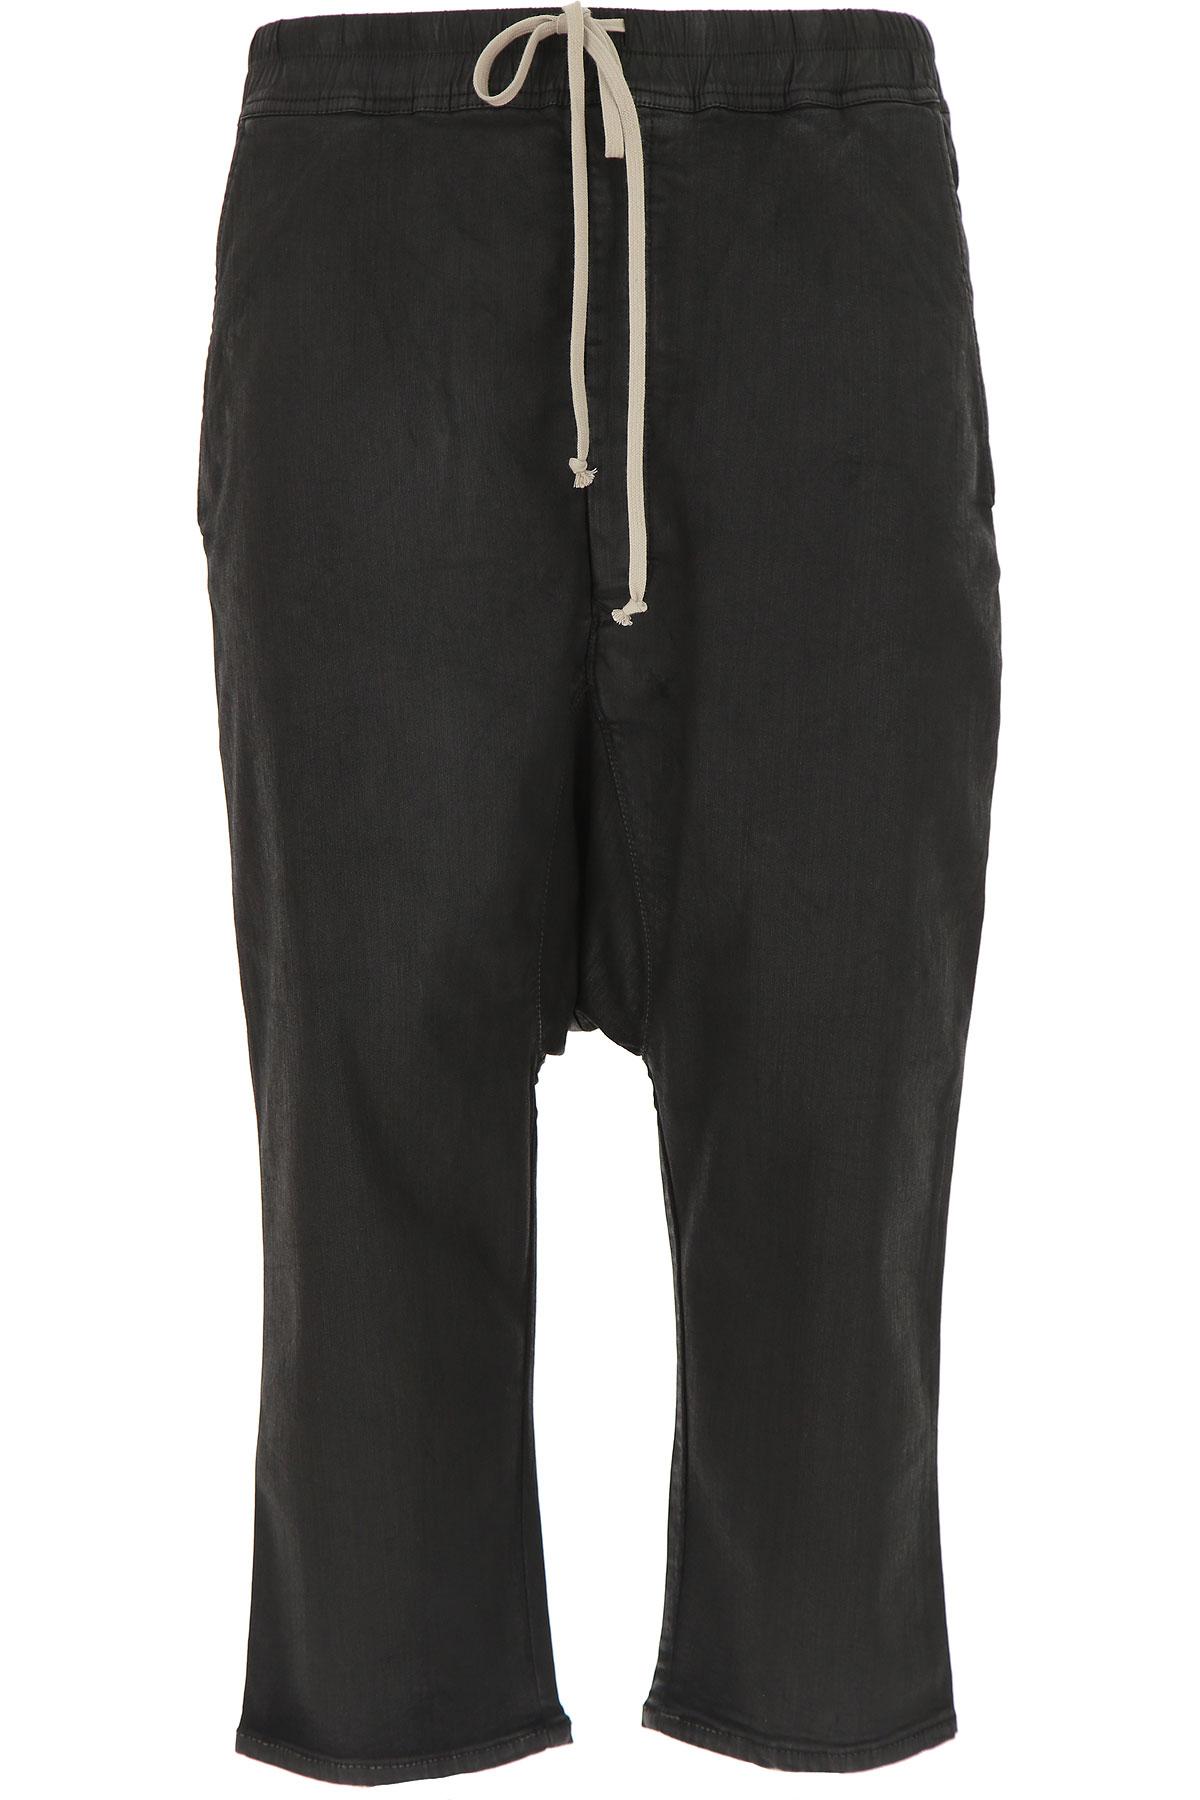 Image of Rick Owens DRKSHDW Mens Clothing, Black, Cotton, 2017, L M S XS